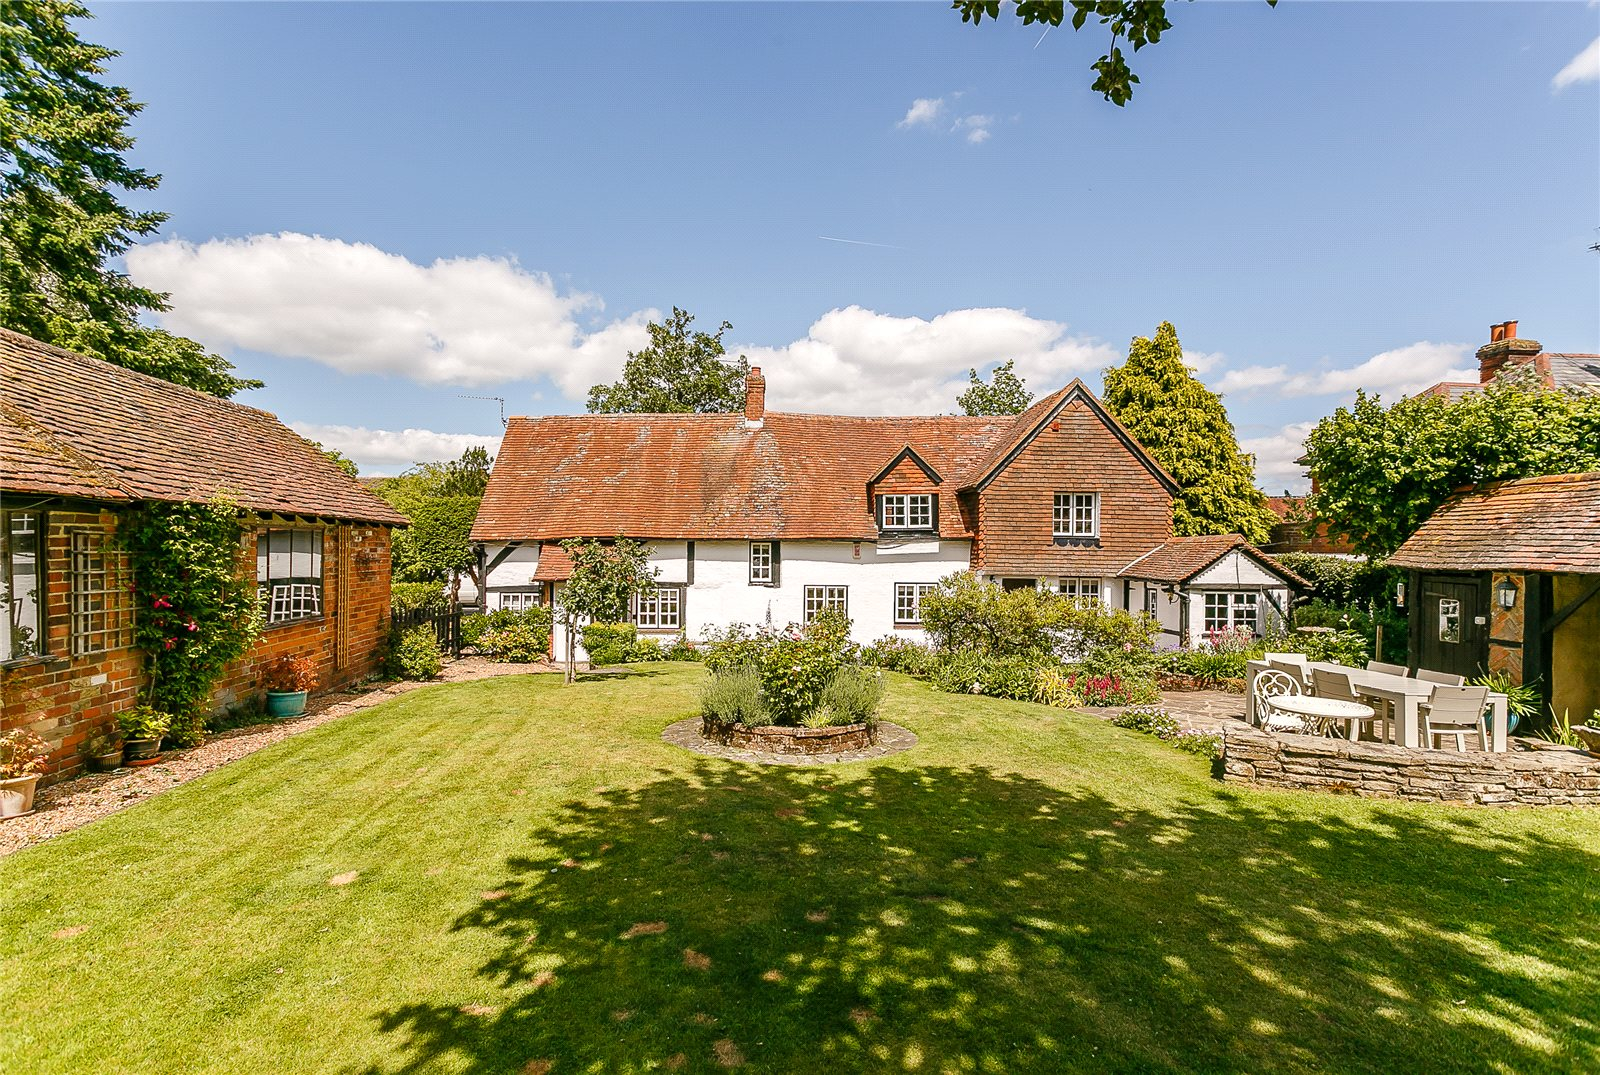 Casa para uma família para Venda às The Street, Crookham Village, Fleet, Hampshire, GU51 Fleet, Inglaterra